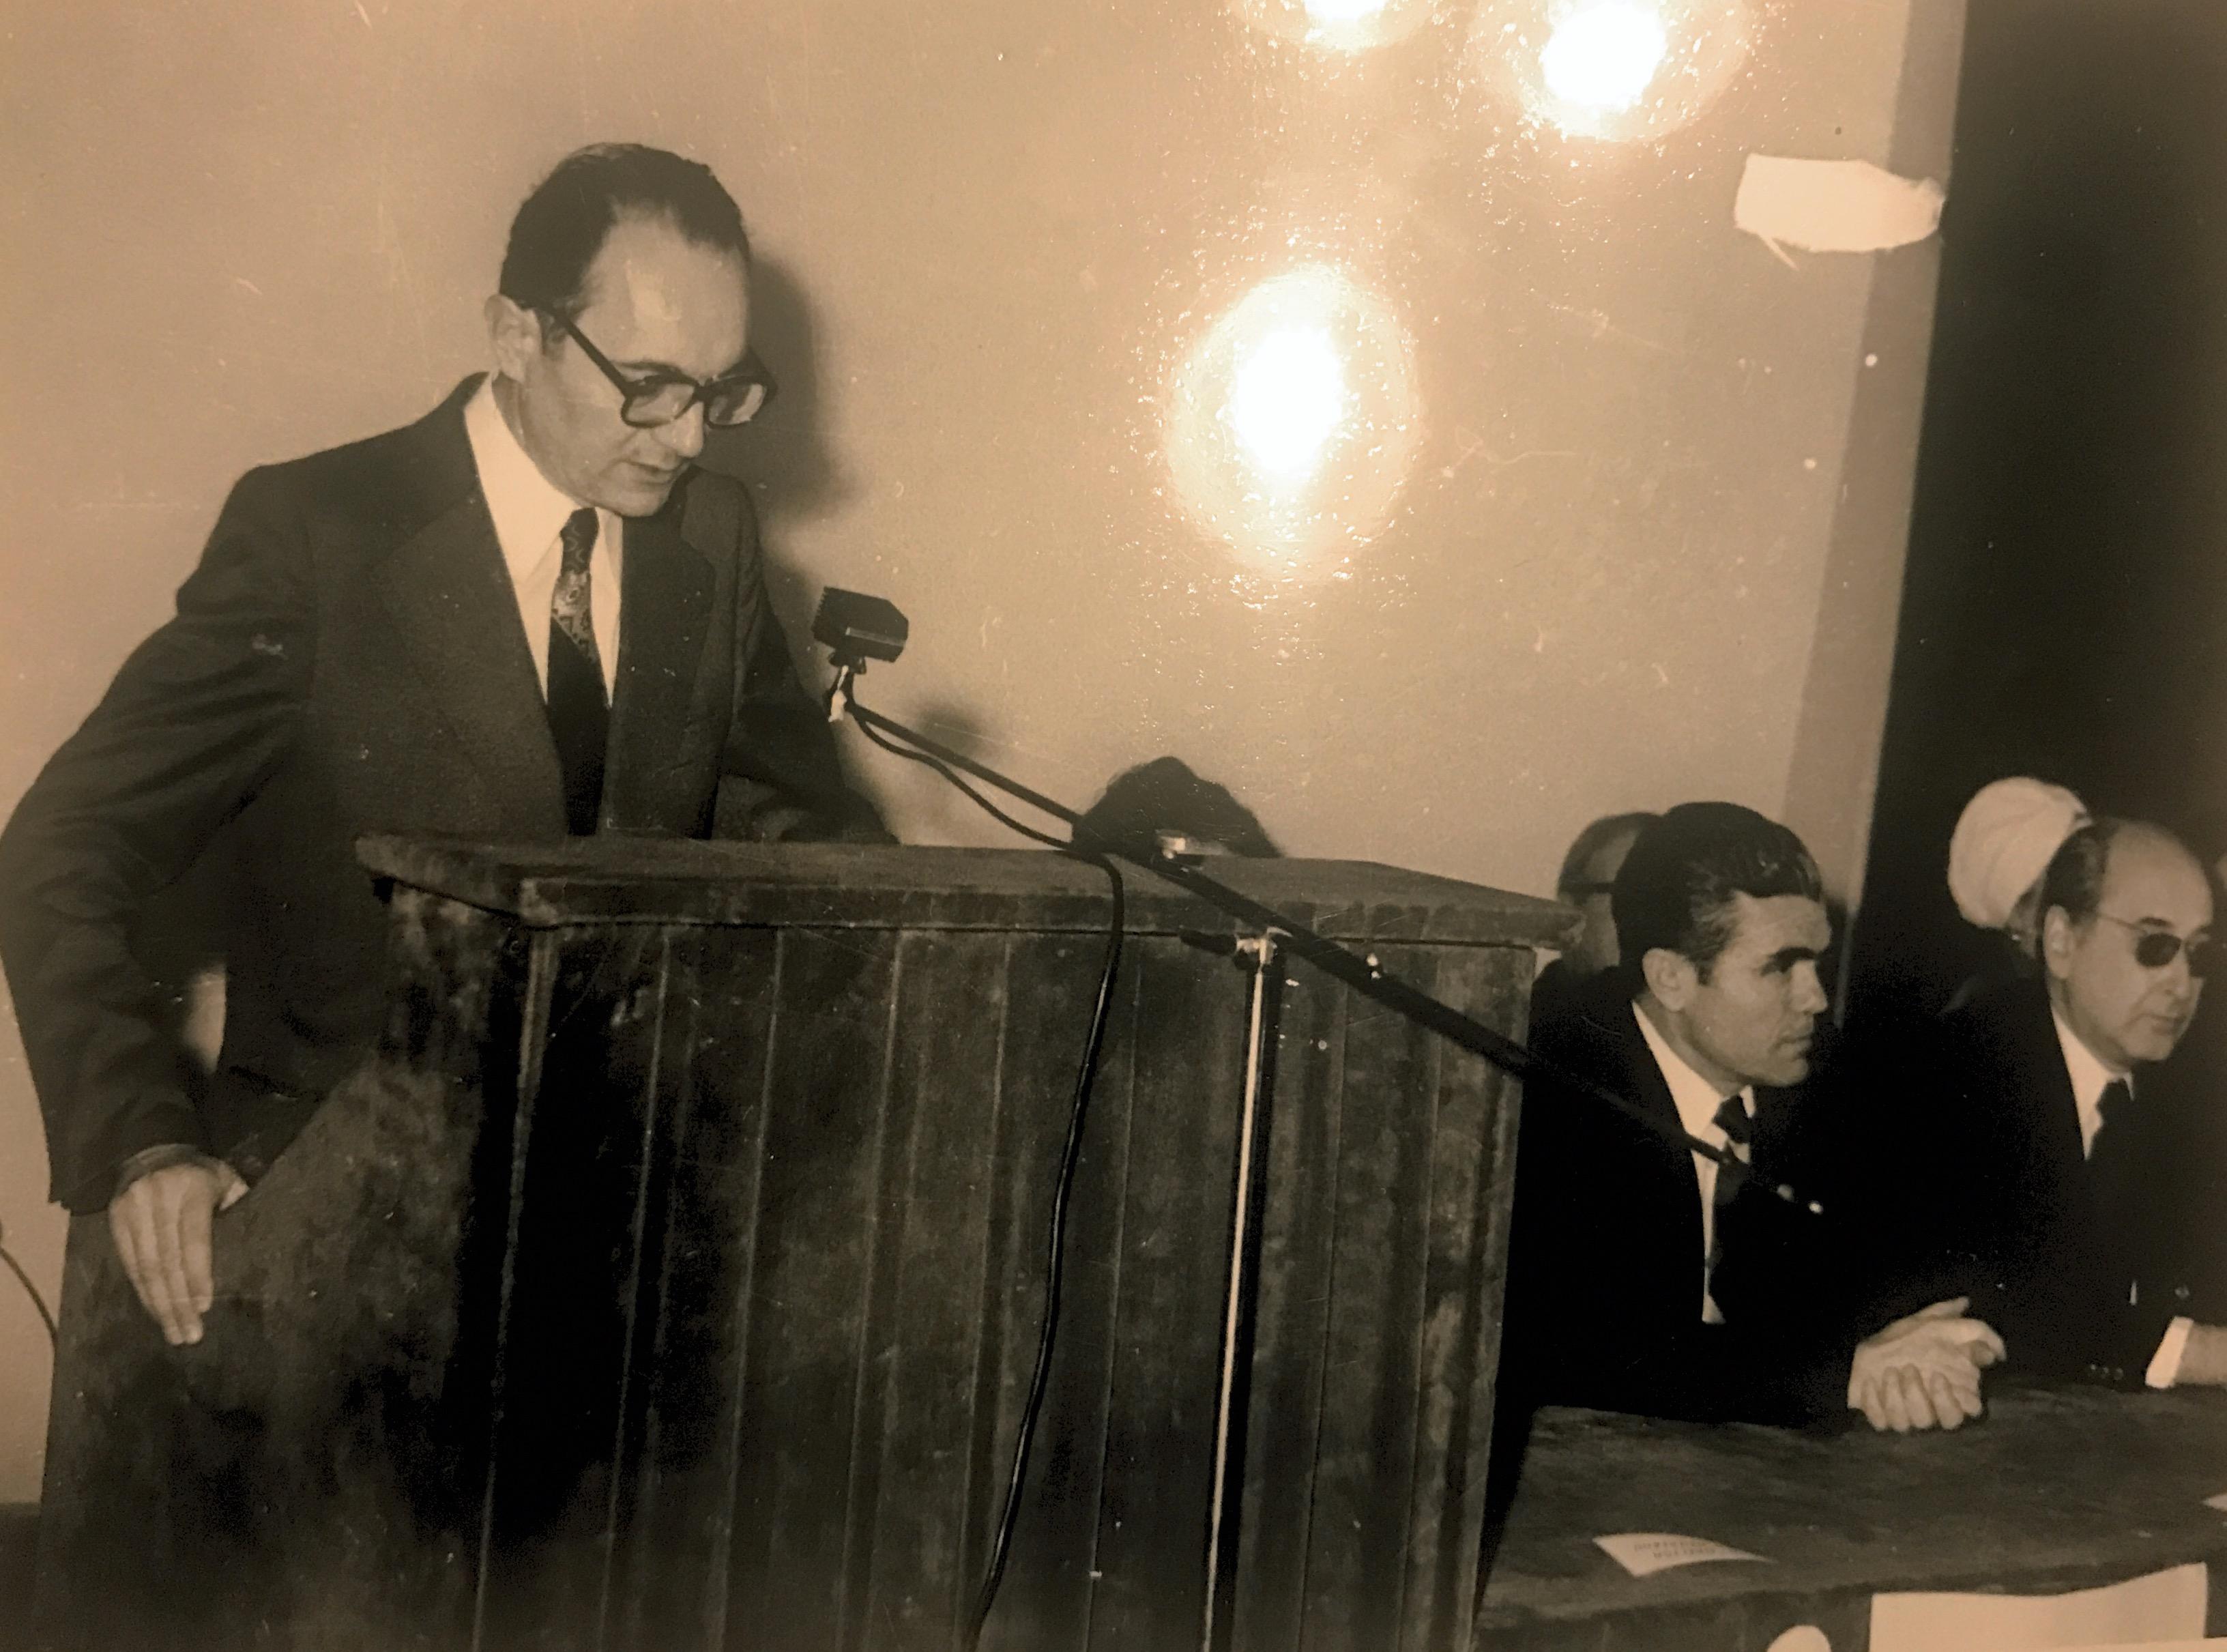 Mario Duma, Calin Mihaileanu cca 1975